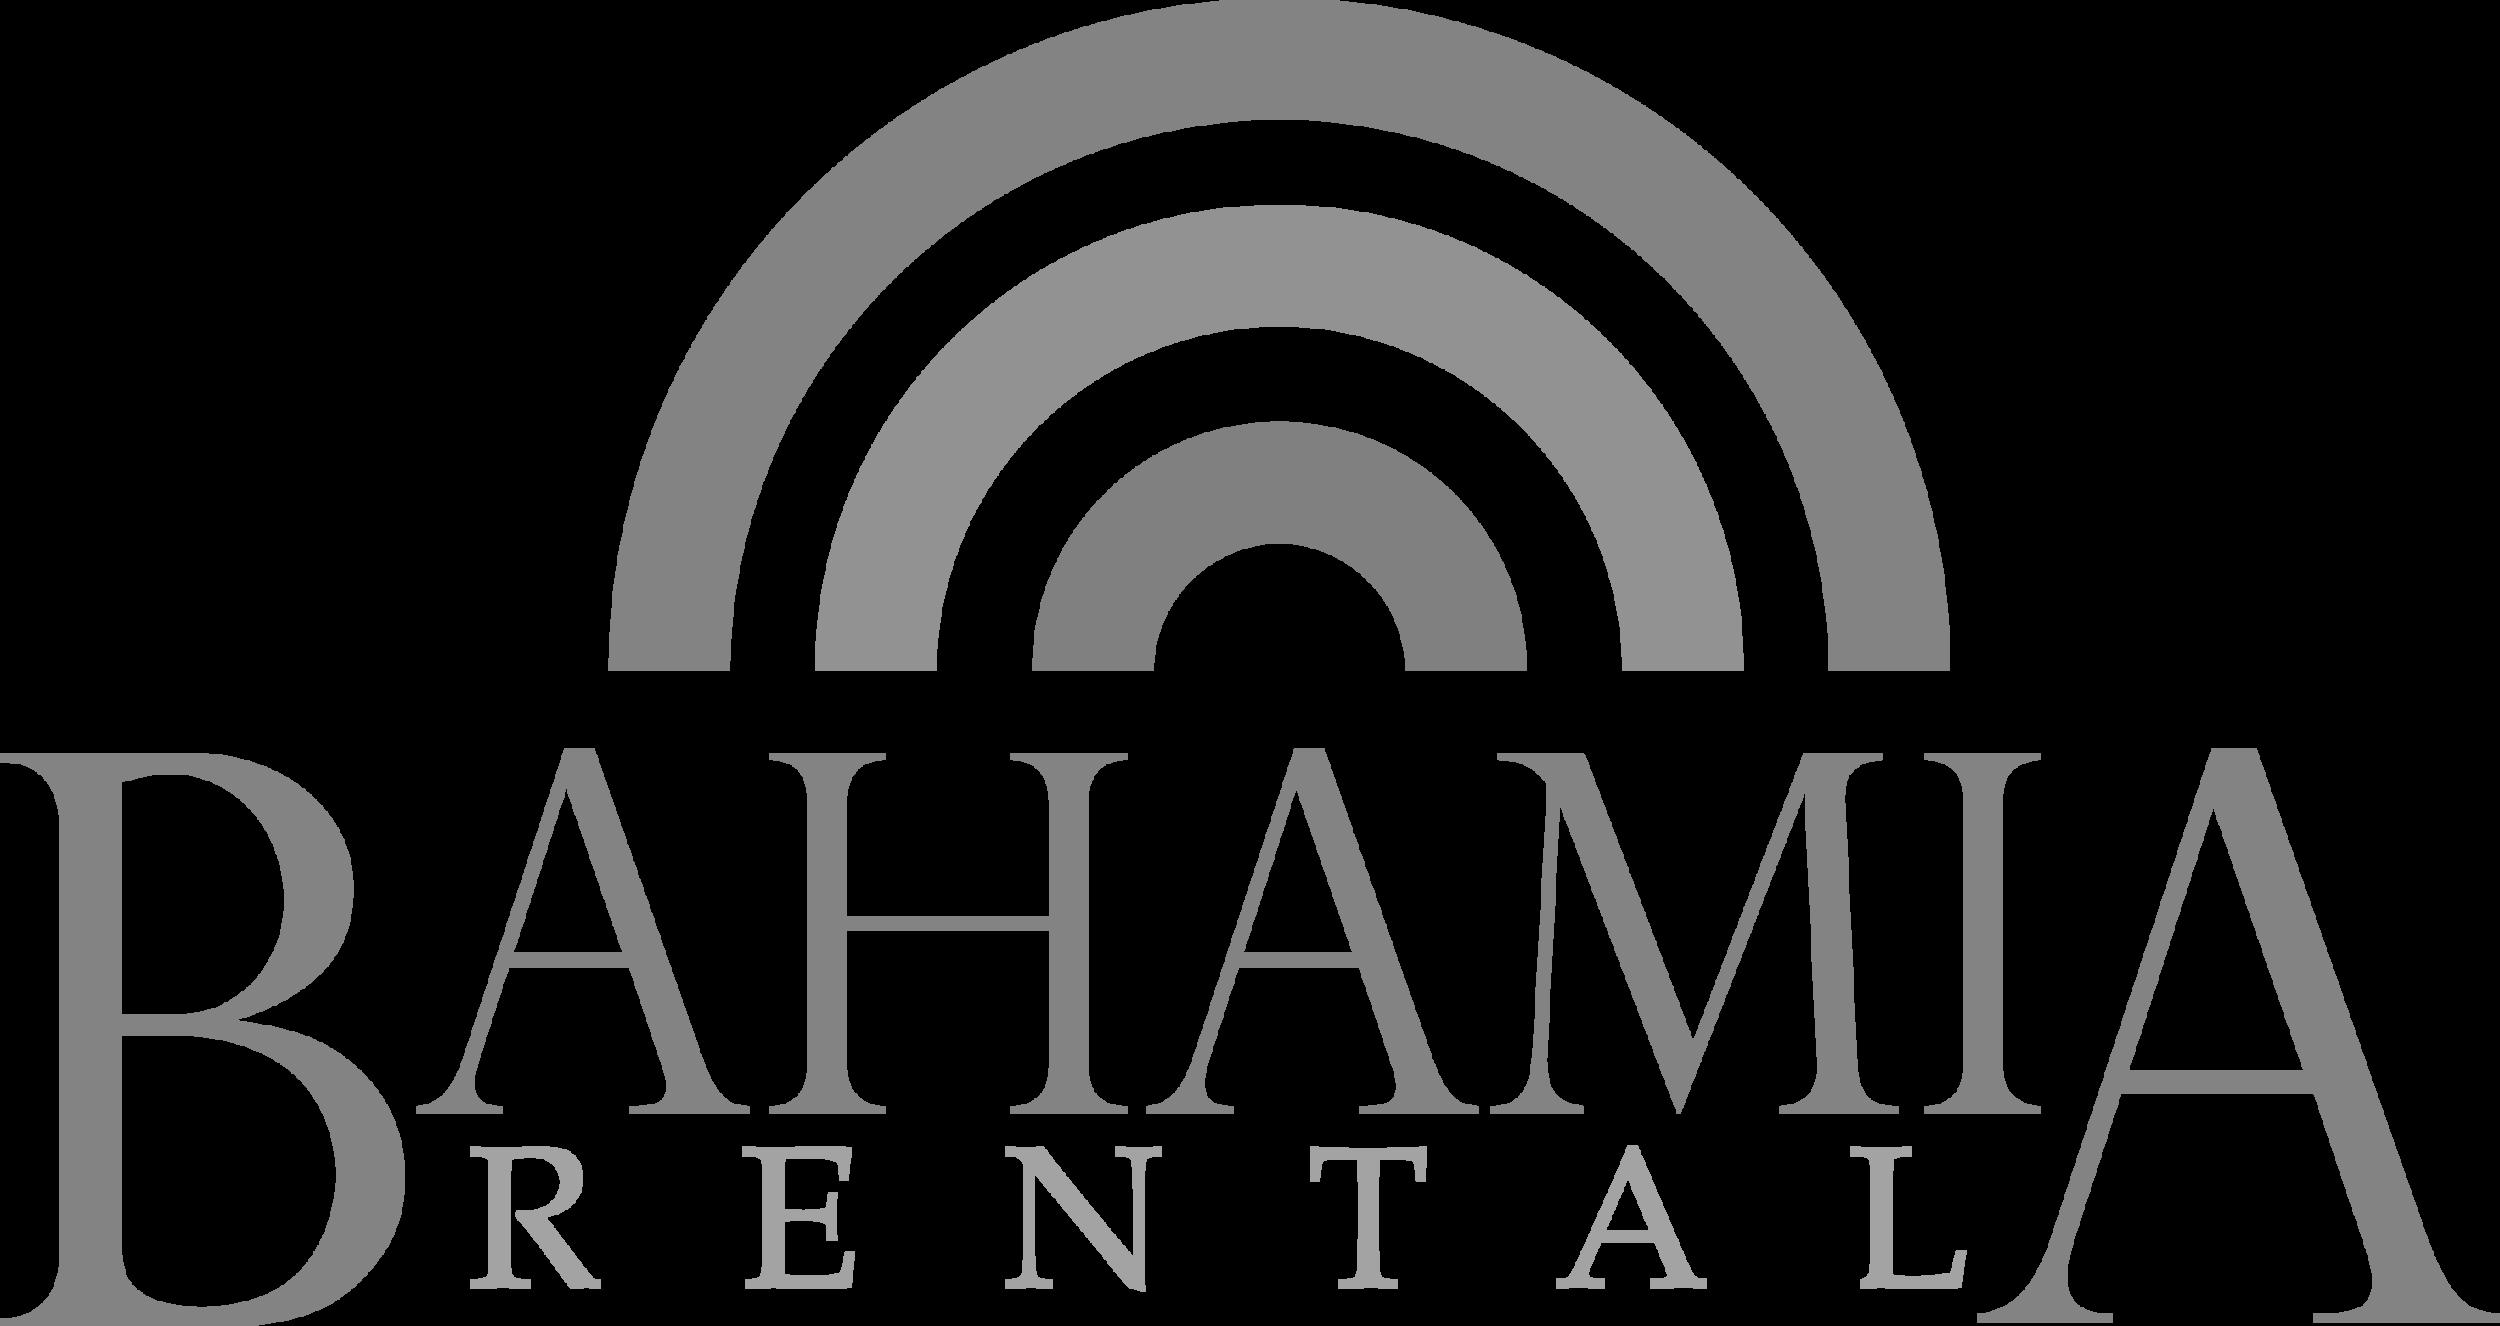 bahamia rental logo - B&W.png